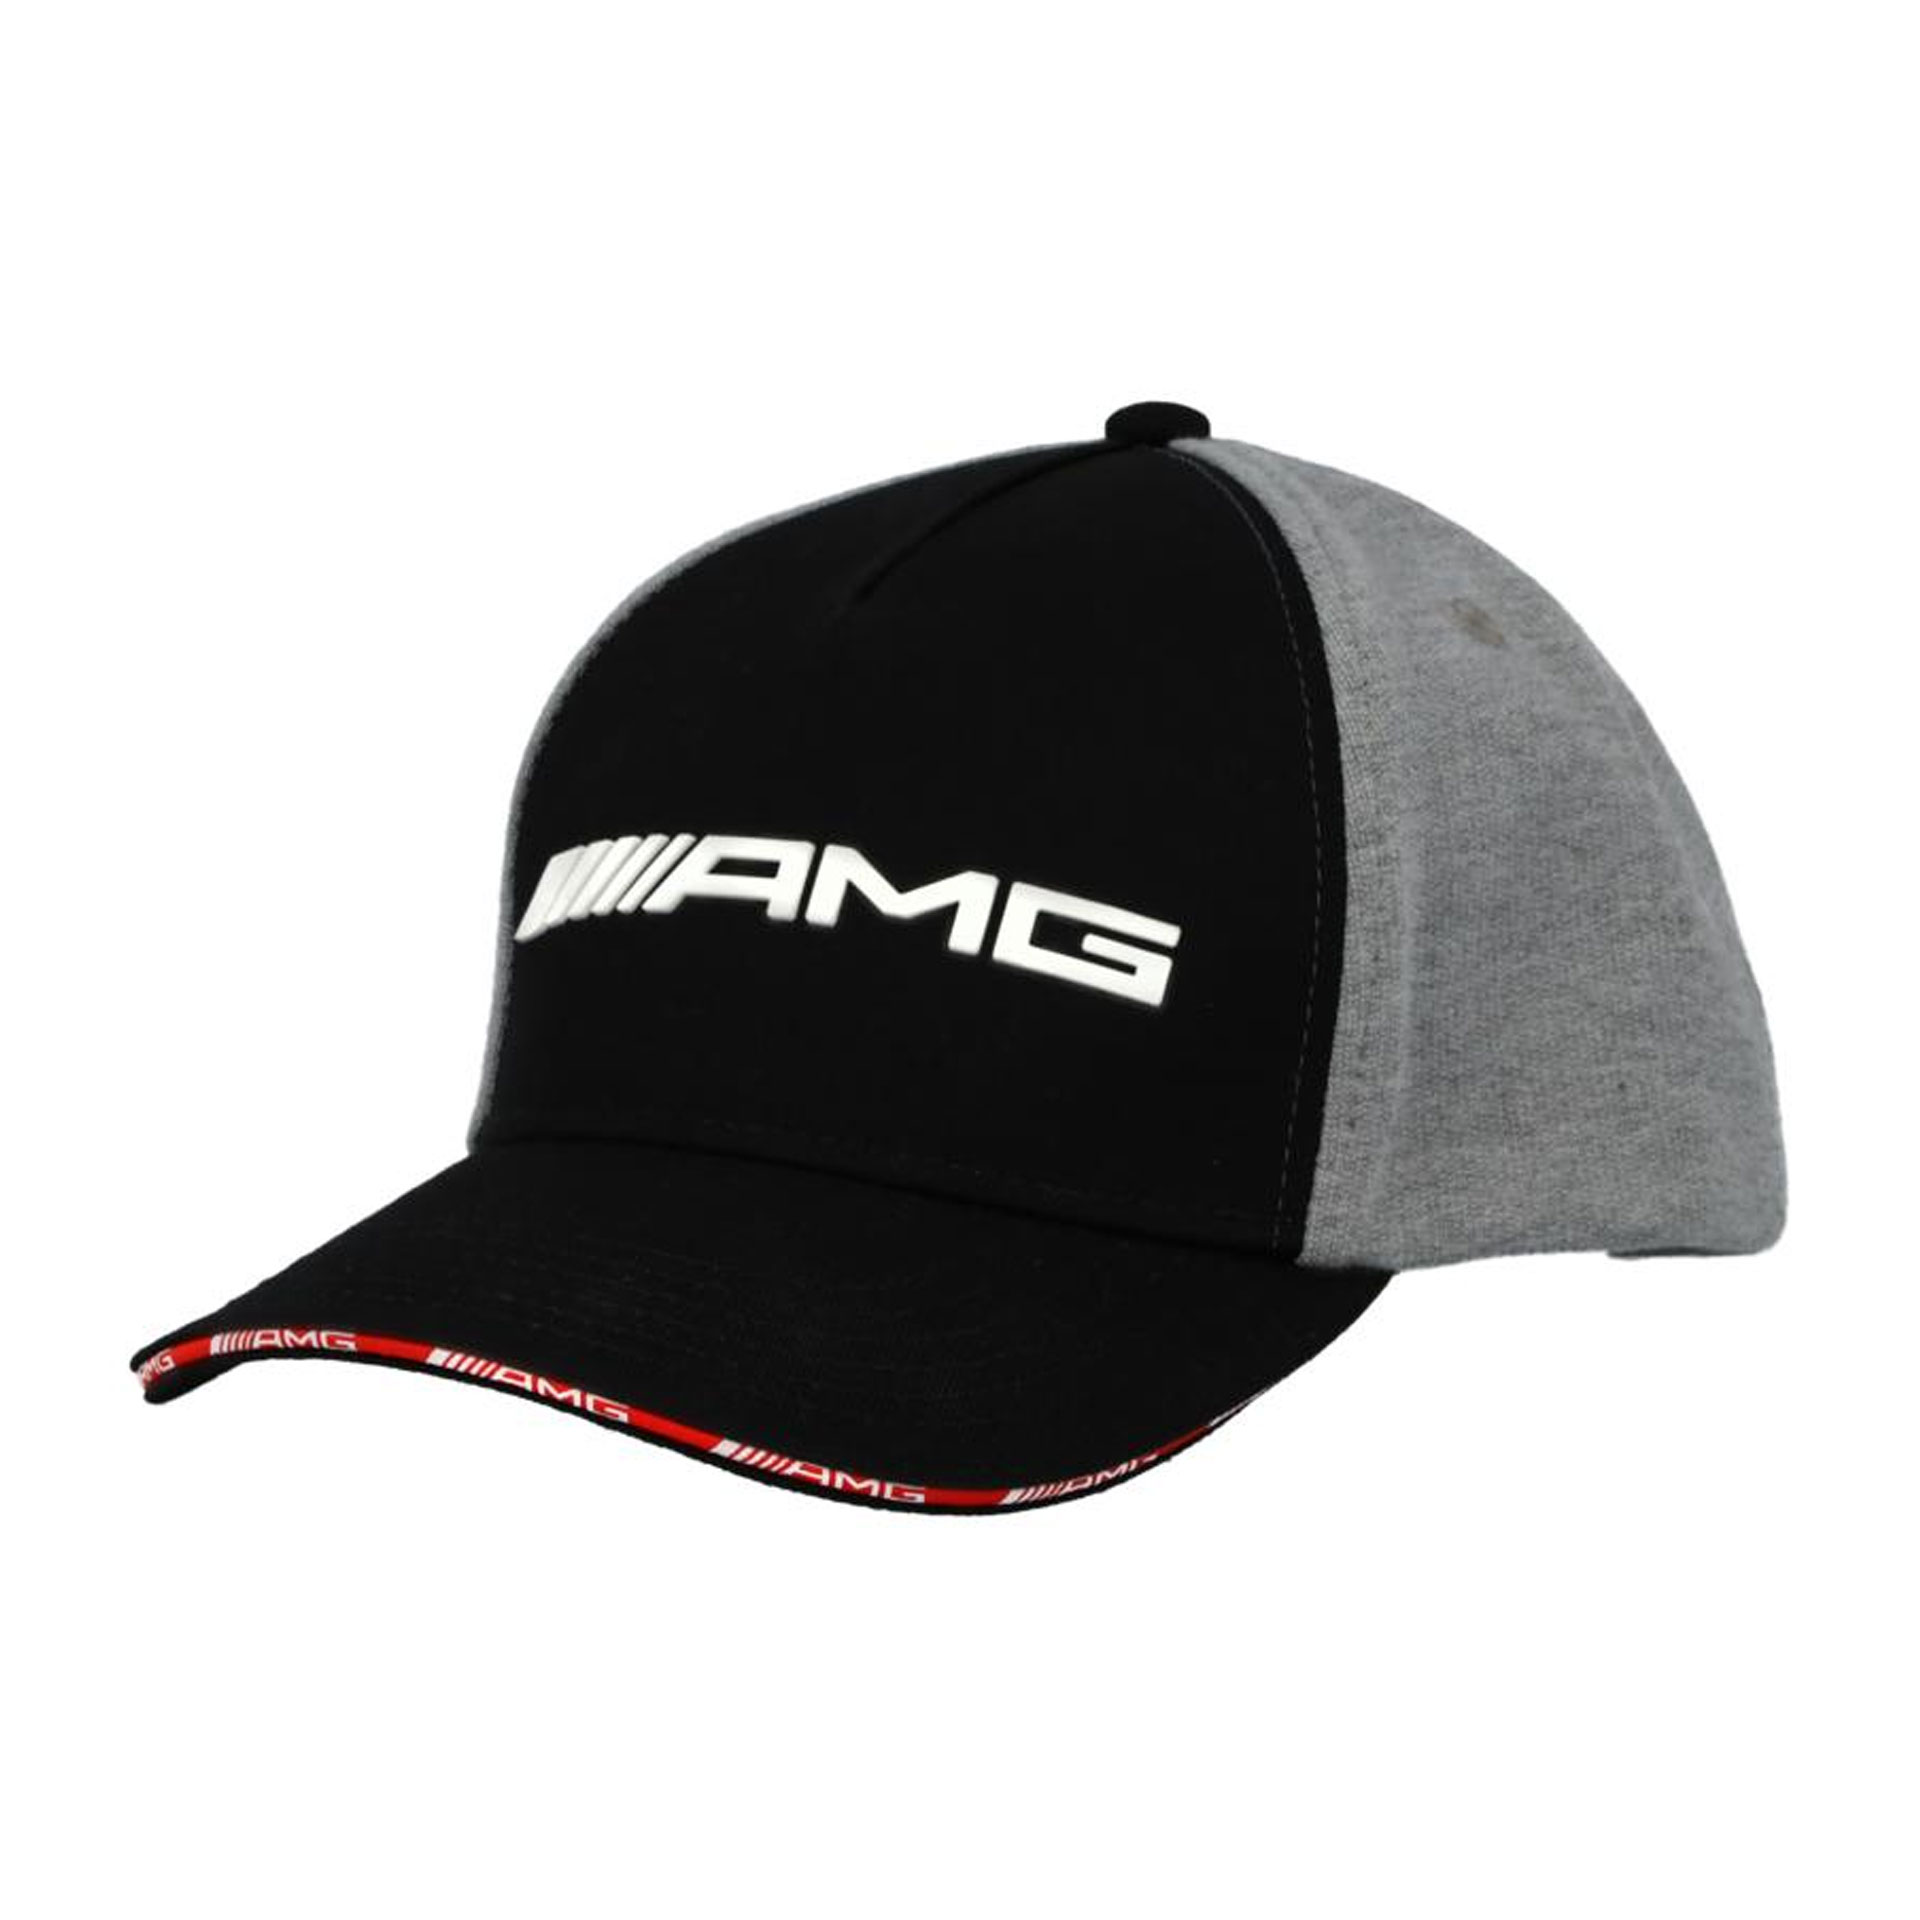 Mercedes-AMG Cap Kinder Kappe Basecap